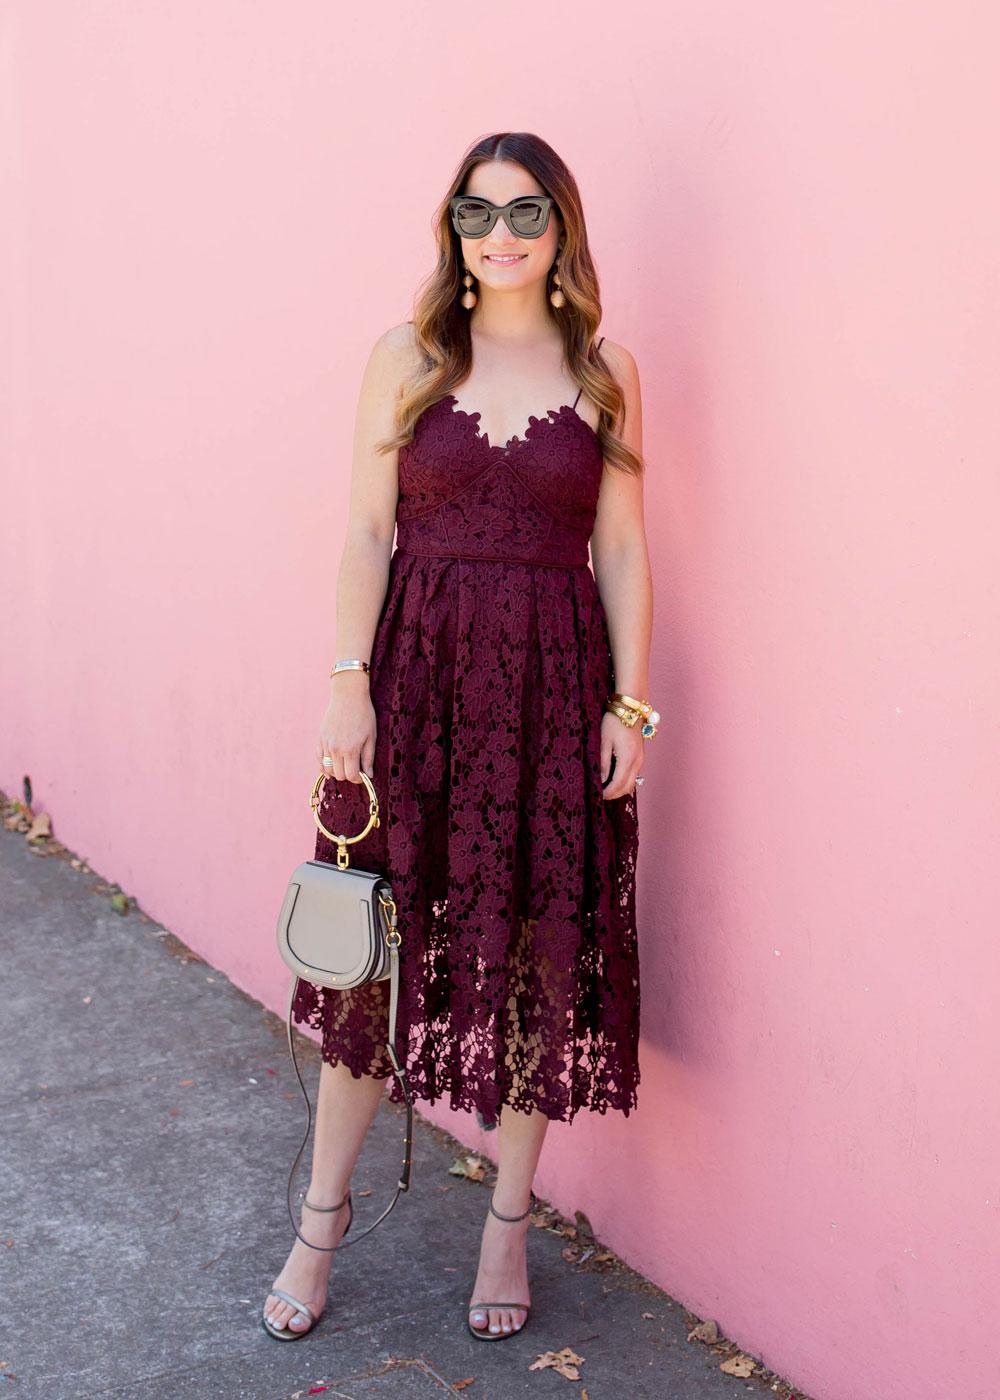 Burgundy Lace Midi Dress At A Pink Wall In San Francisco